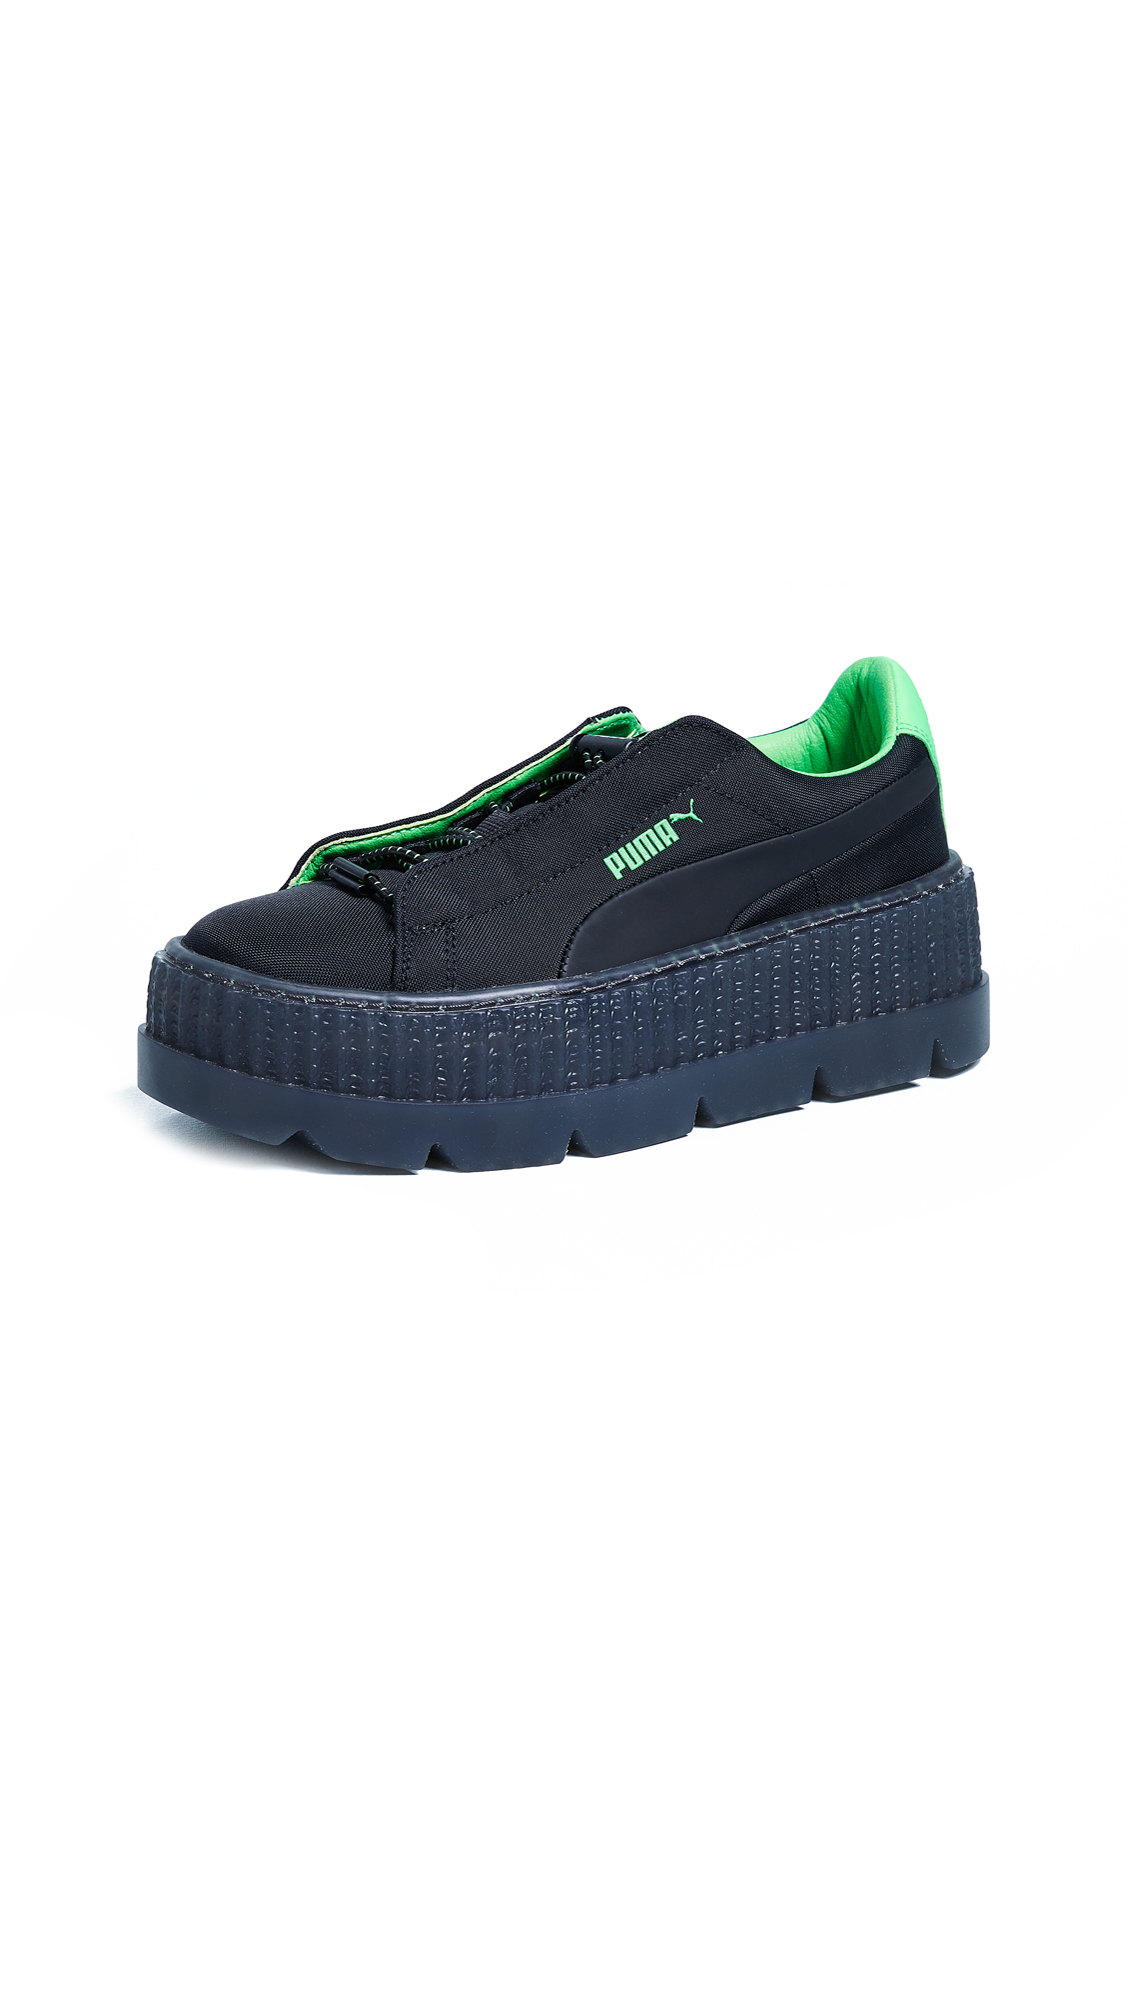 PUMA FENTY x PUMA Surf Creeper Sneakers - Puma Black/Green Gecko/Black